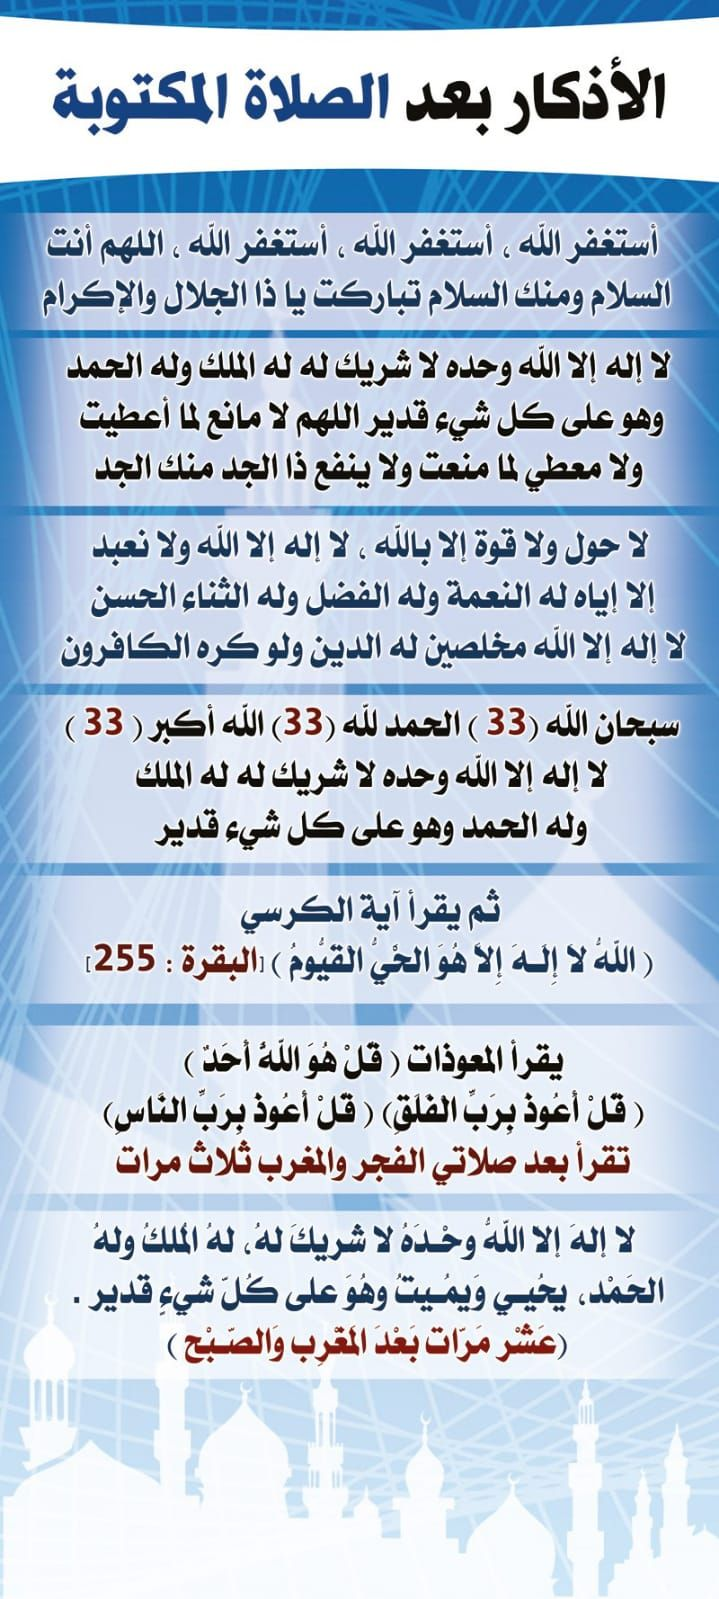 Pin By Fat3890 On Islam Prayers Signs Islam